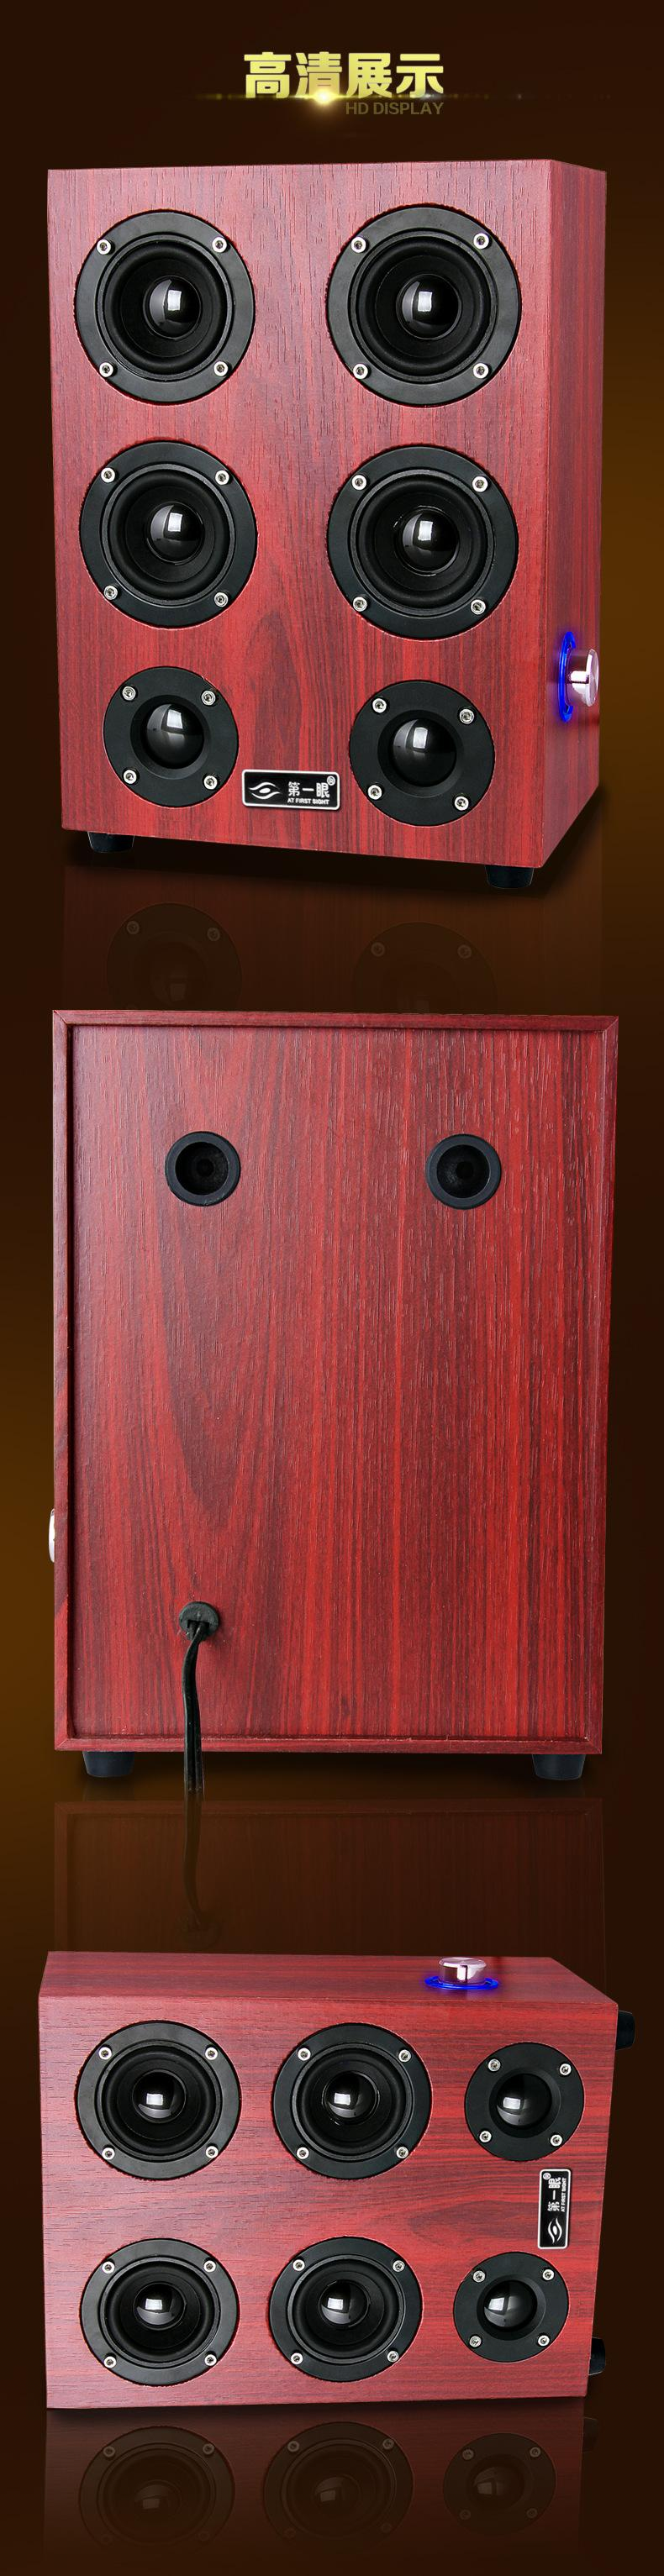 loa gỗ vi tính 6 bass6.jpg